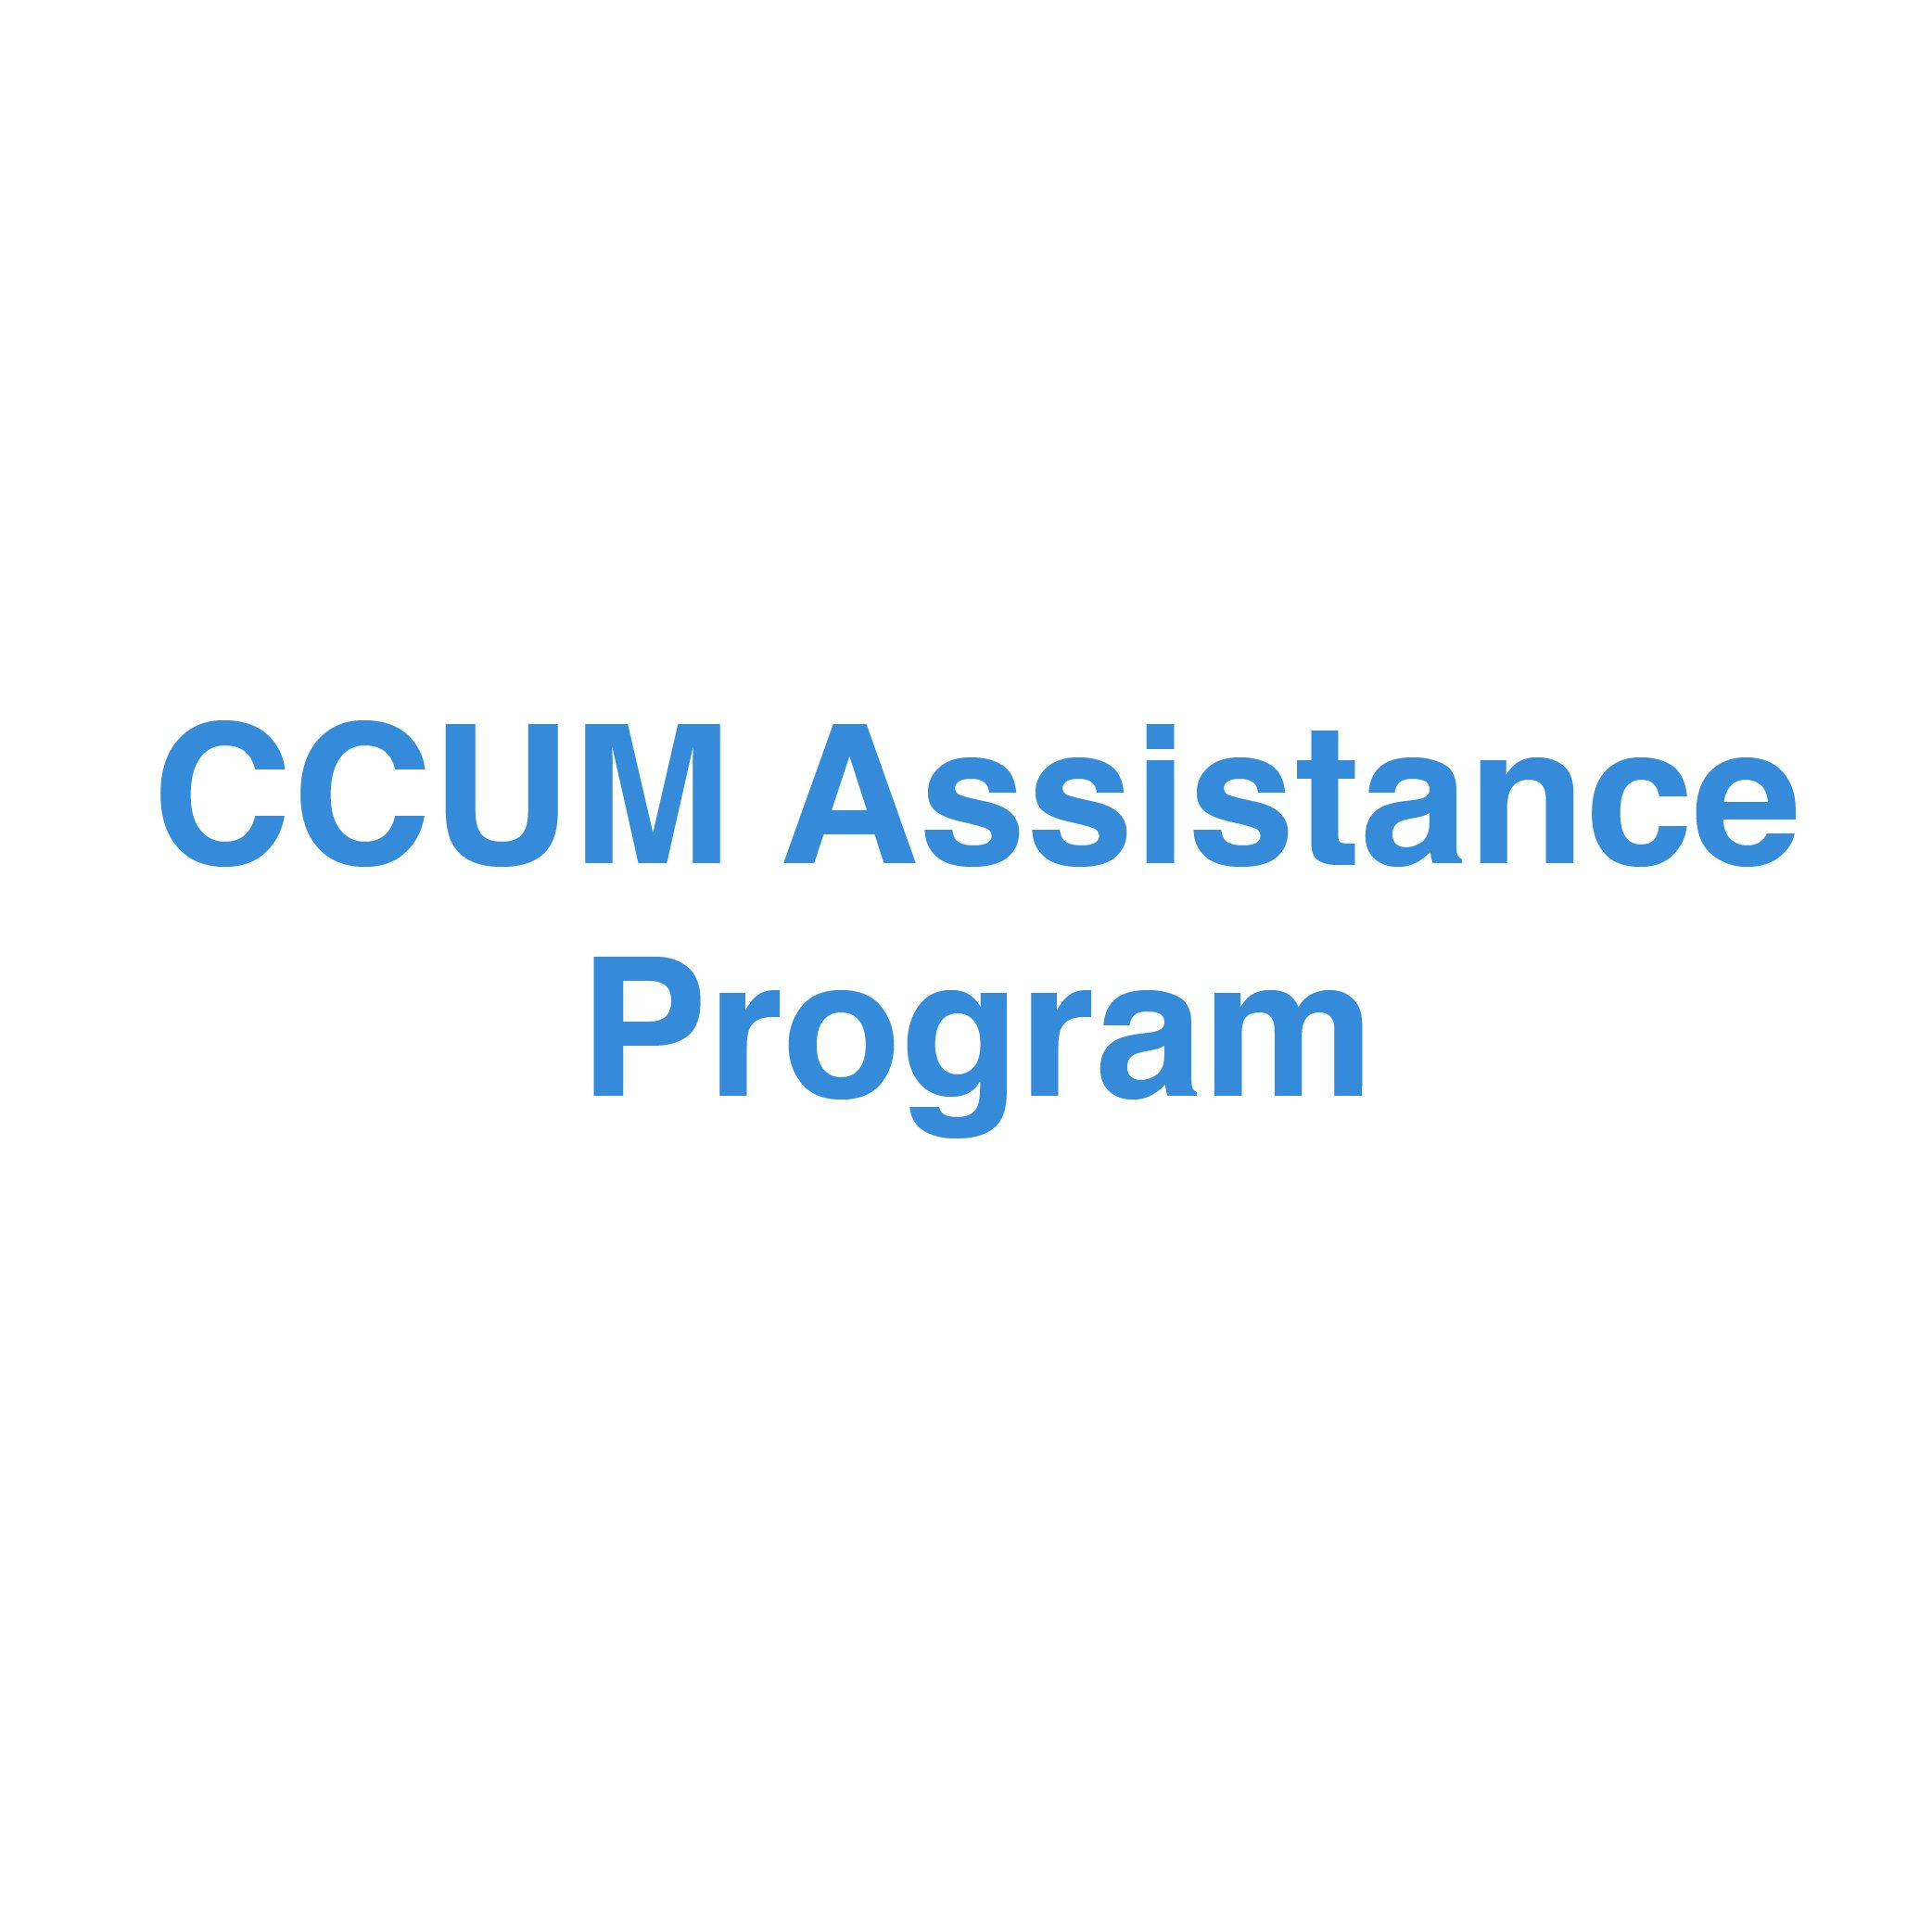 CCUM Assistance Program